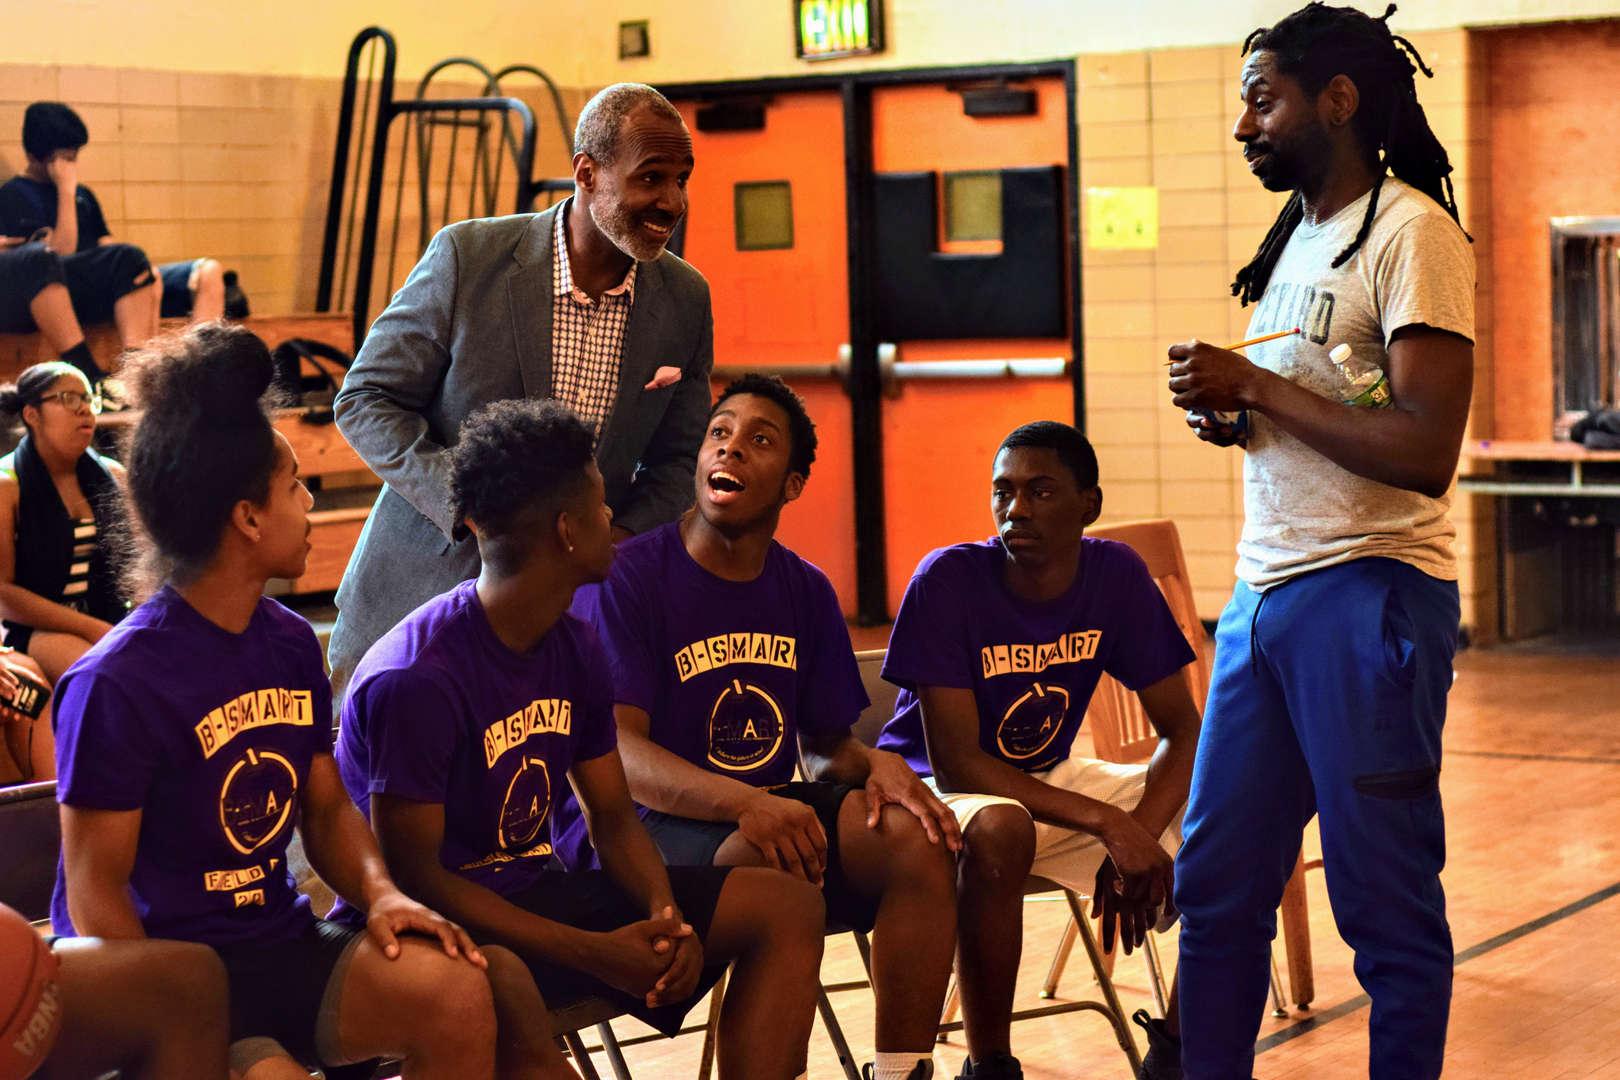 Principal Rainey chats with the basketball team.